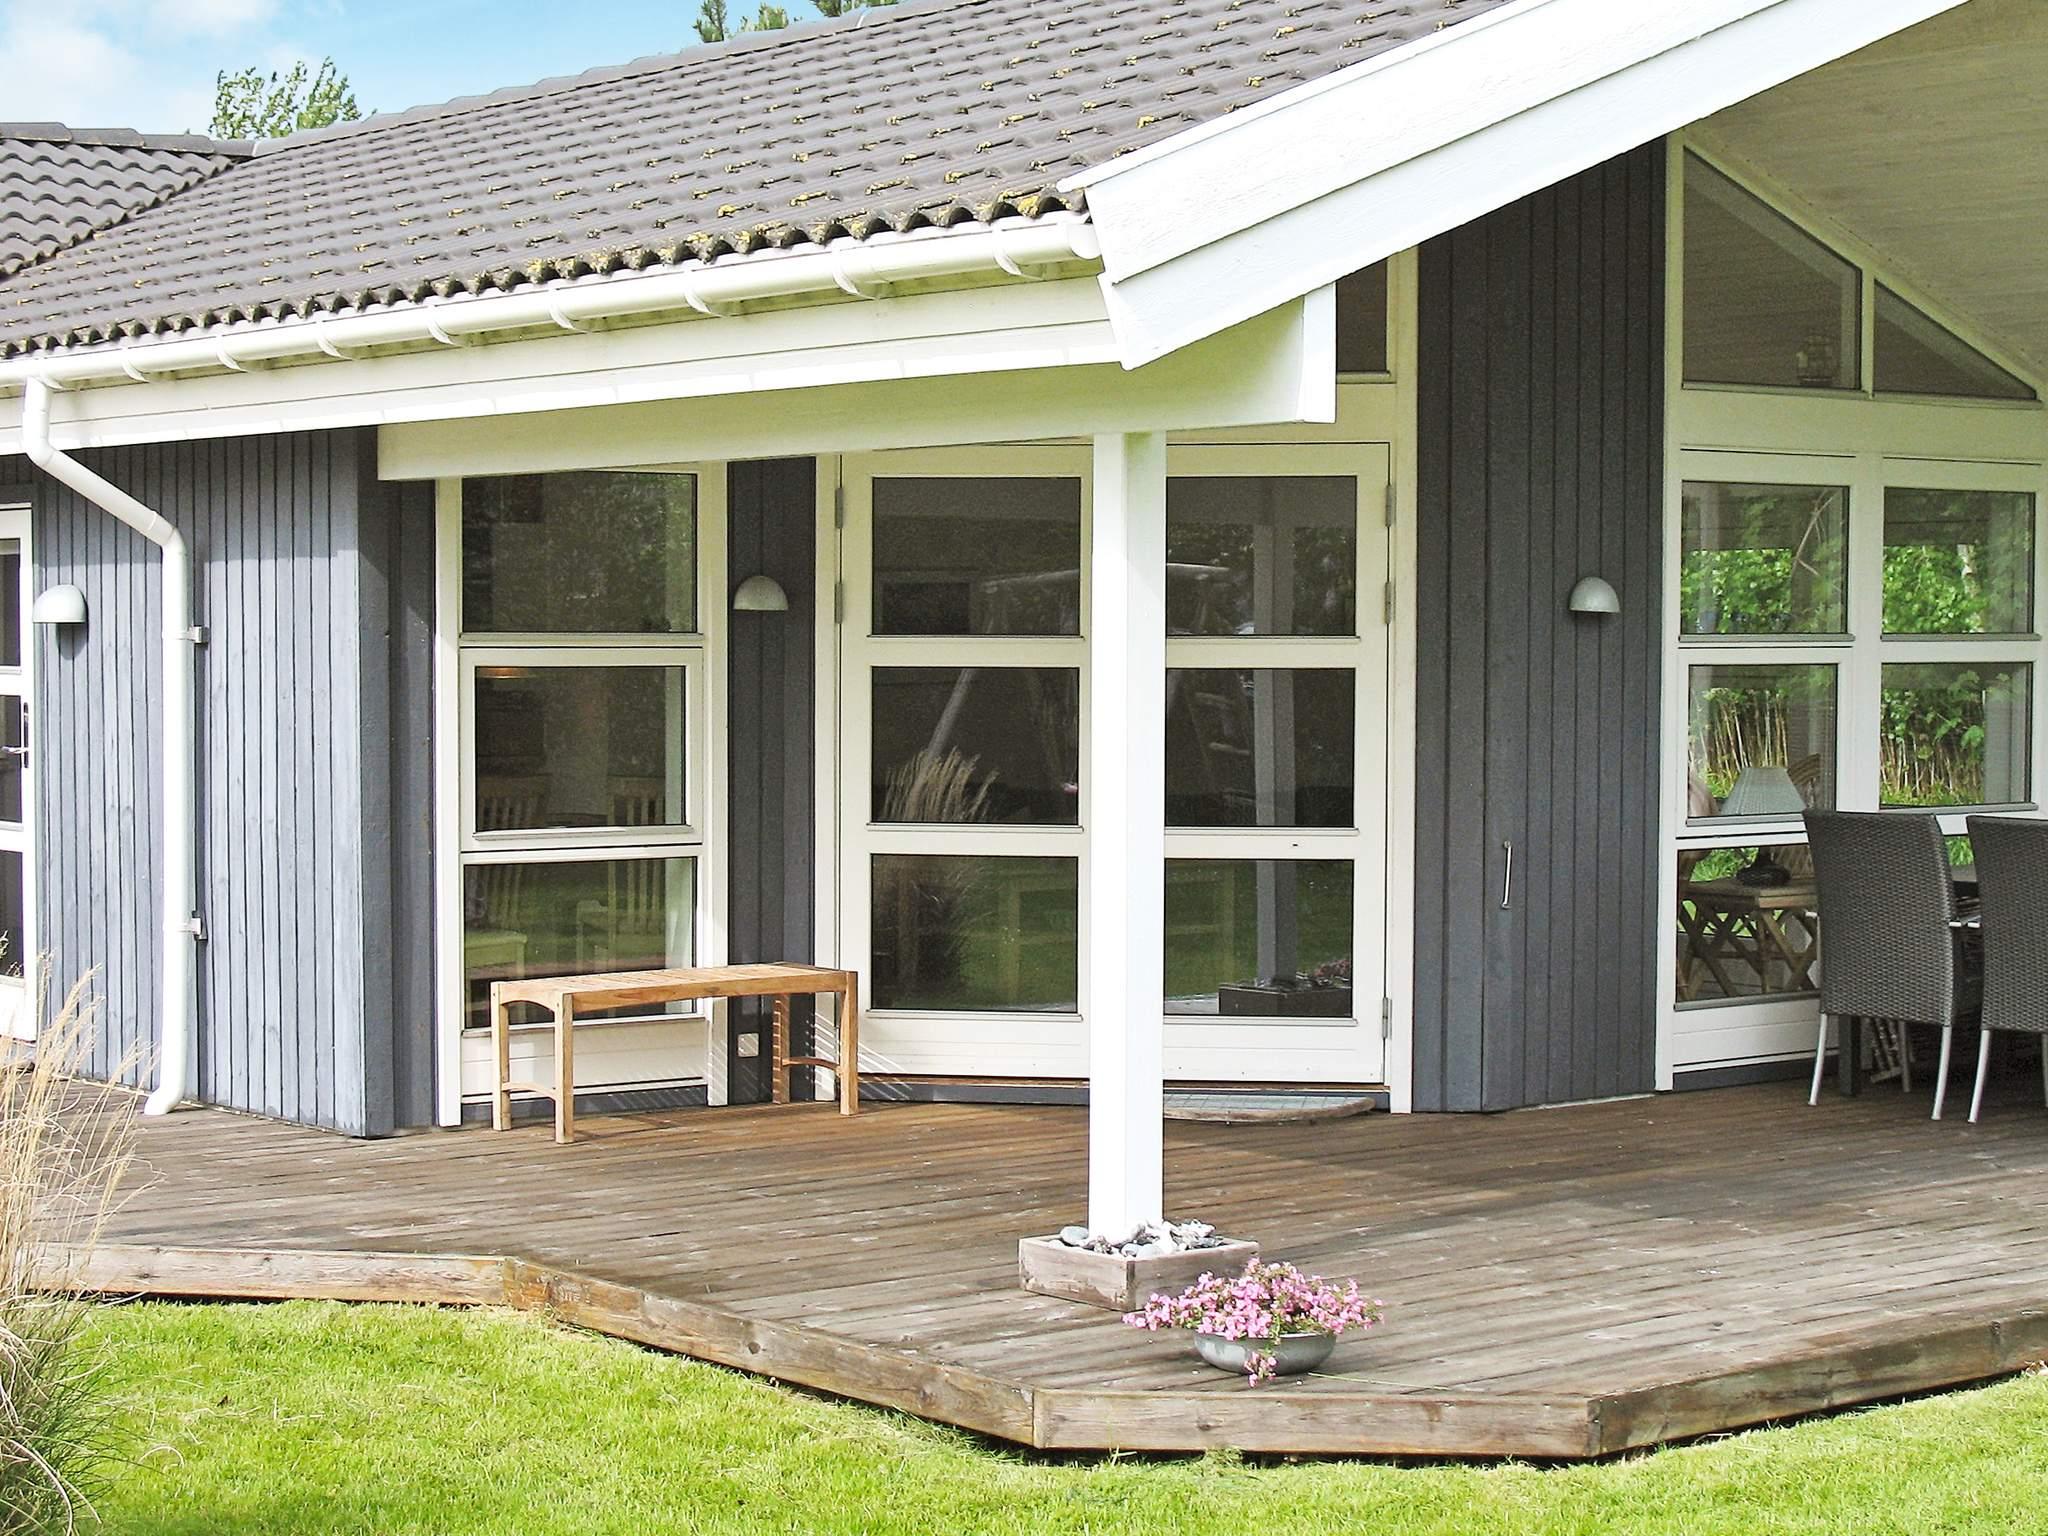 Ferienhaus Råbylille Strand (241708), Råbylille, , Møn, Dänemark, Bild 15